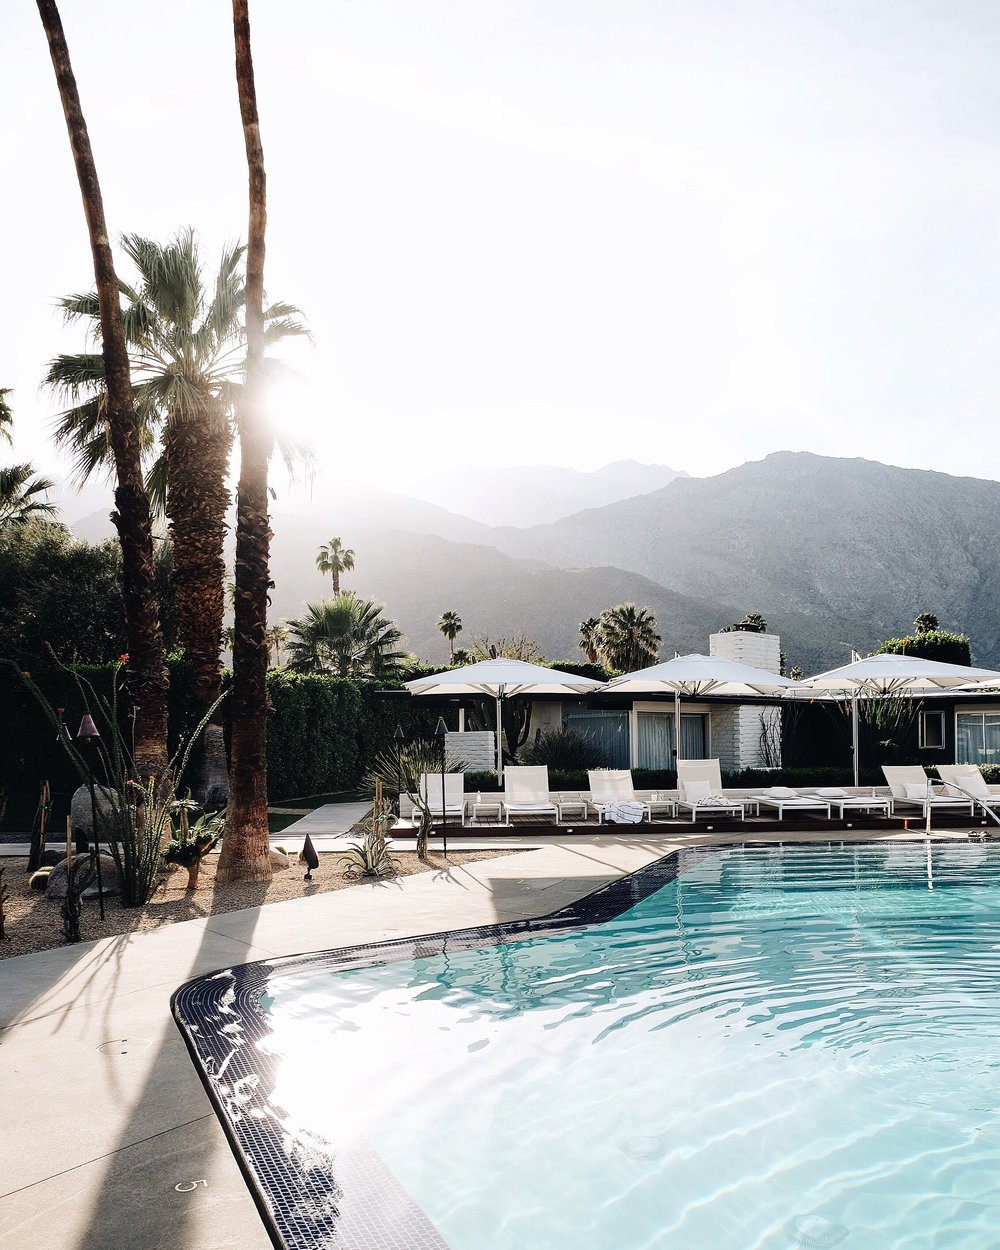 L'Horizon Hotel,Palm Springs Travel Guide